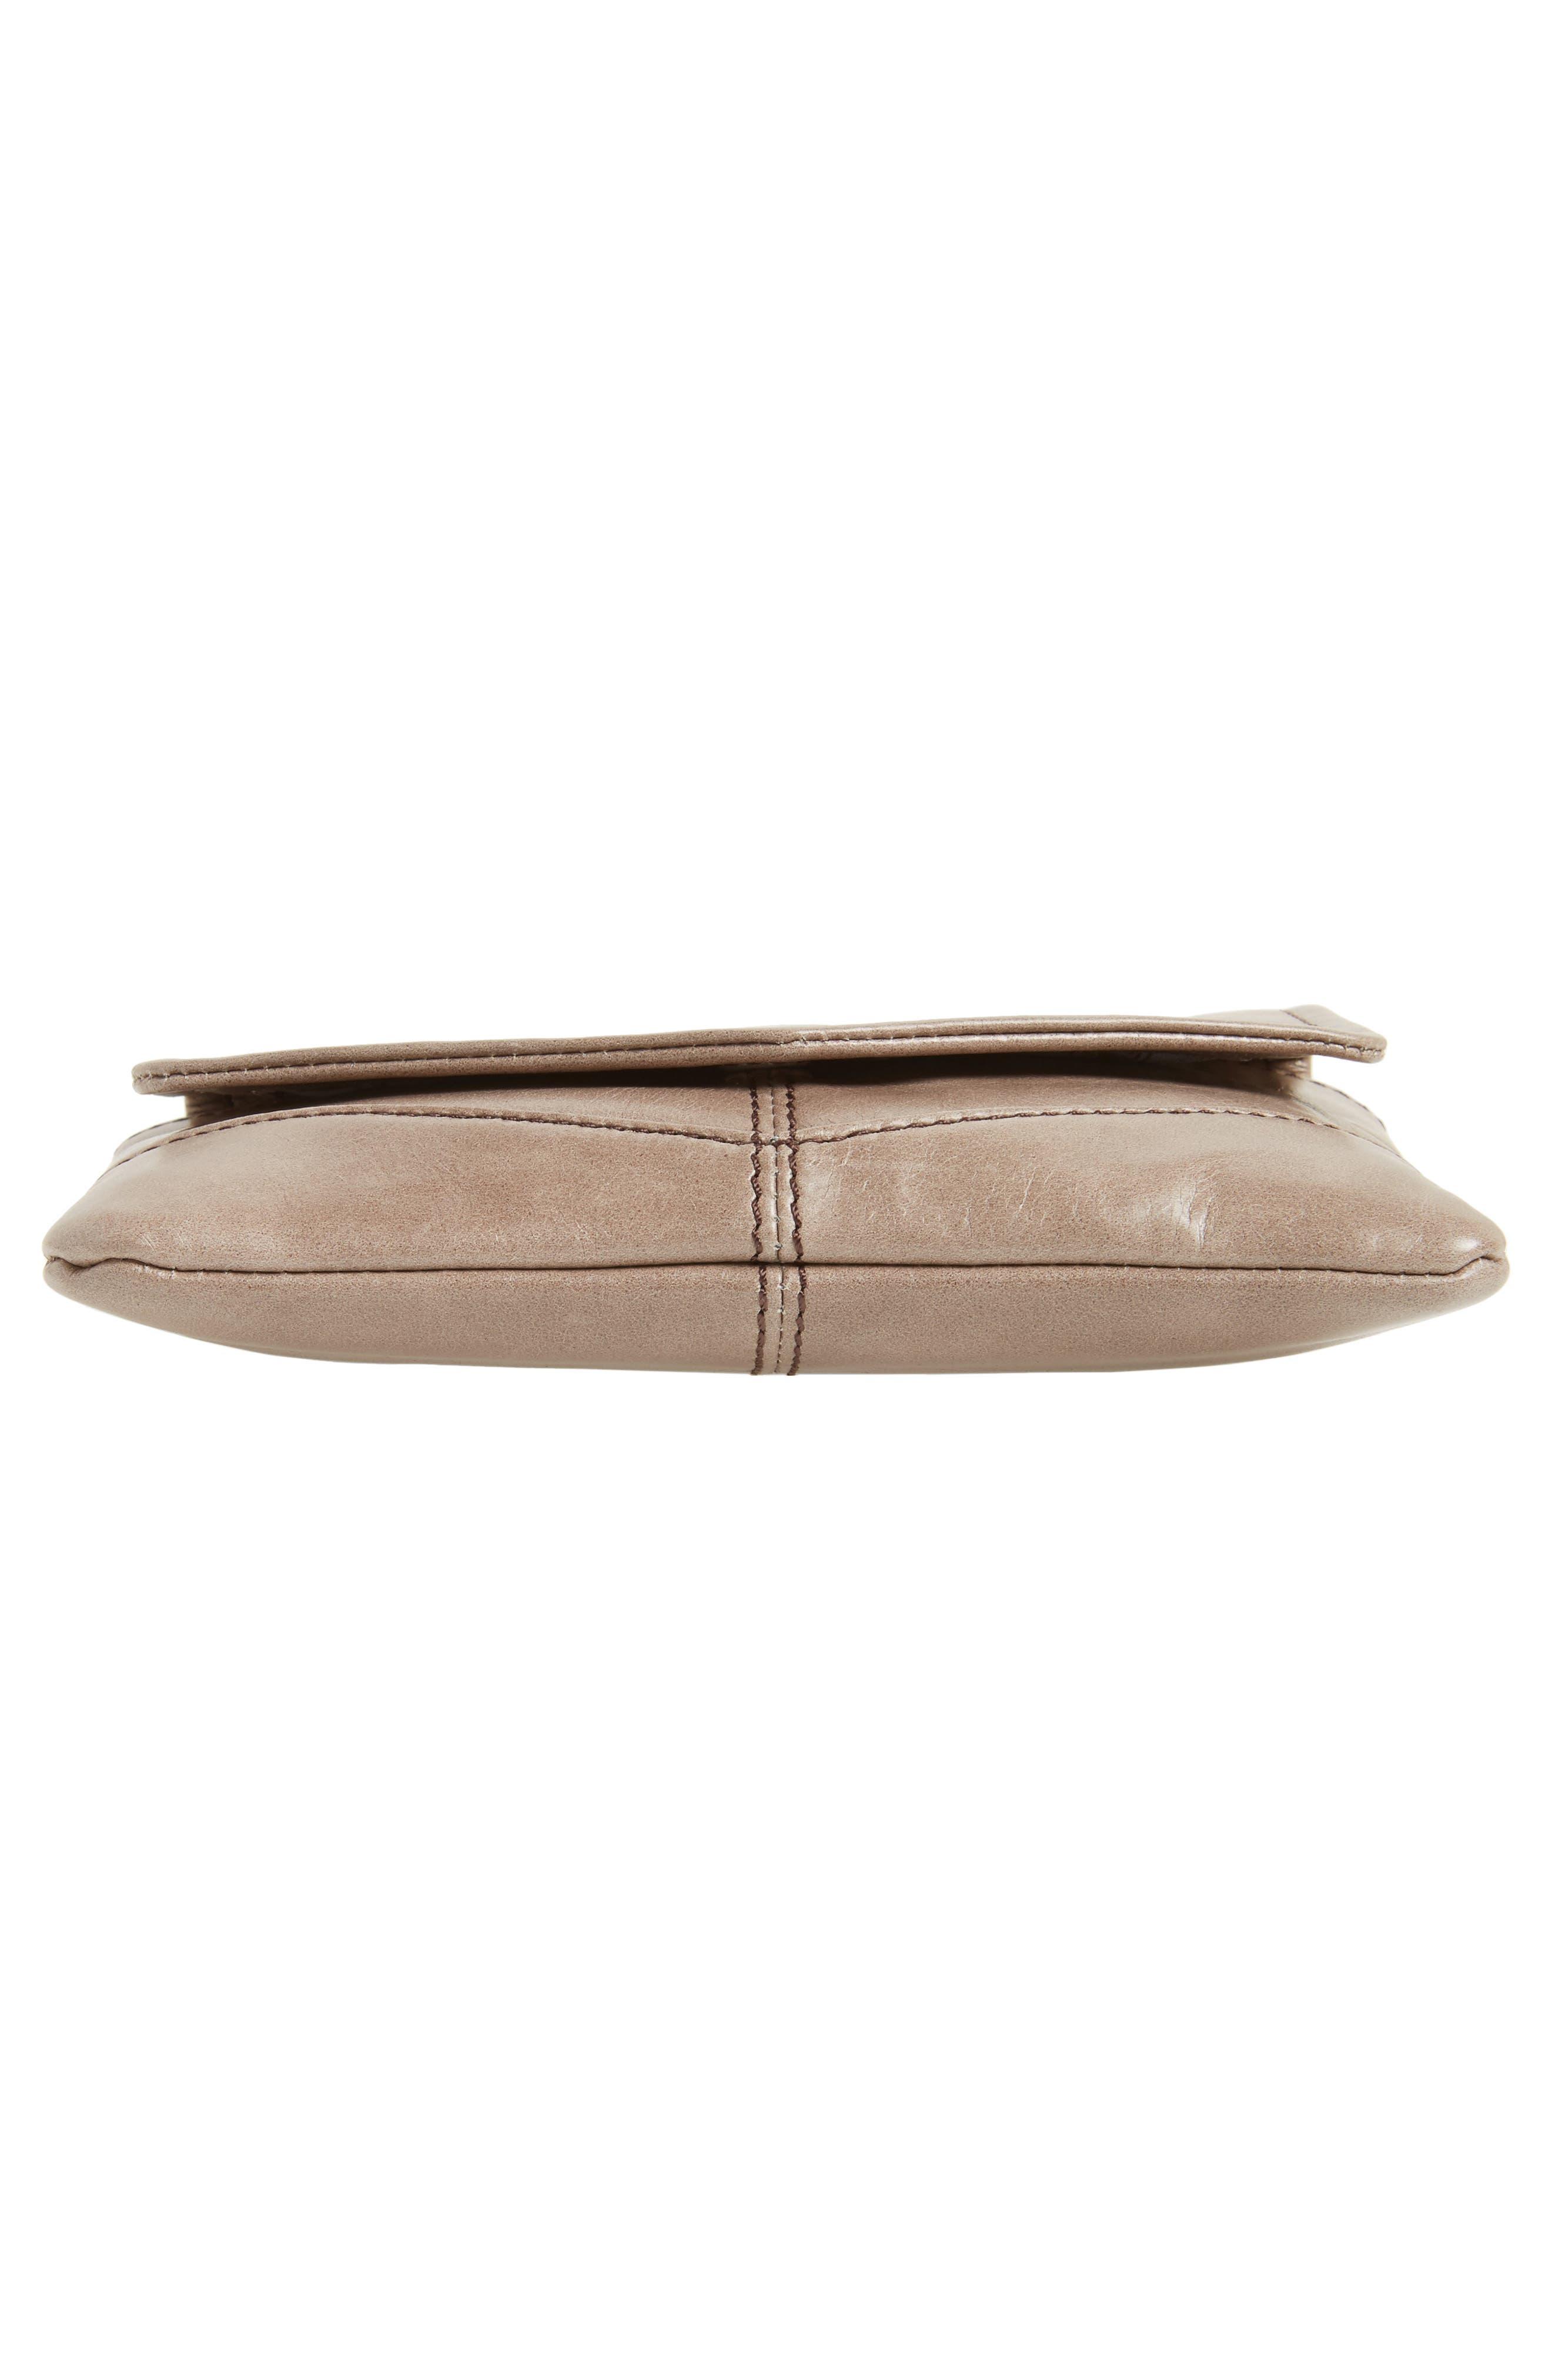 Amble Leather Crossbody Bag,                             Alternate thumbnail 59, color,